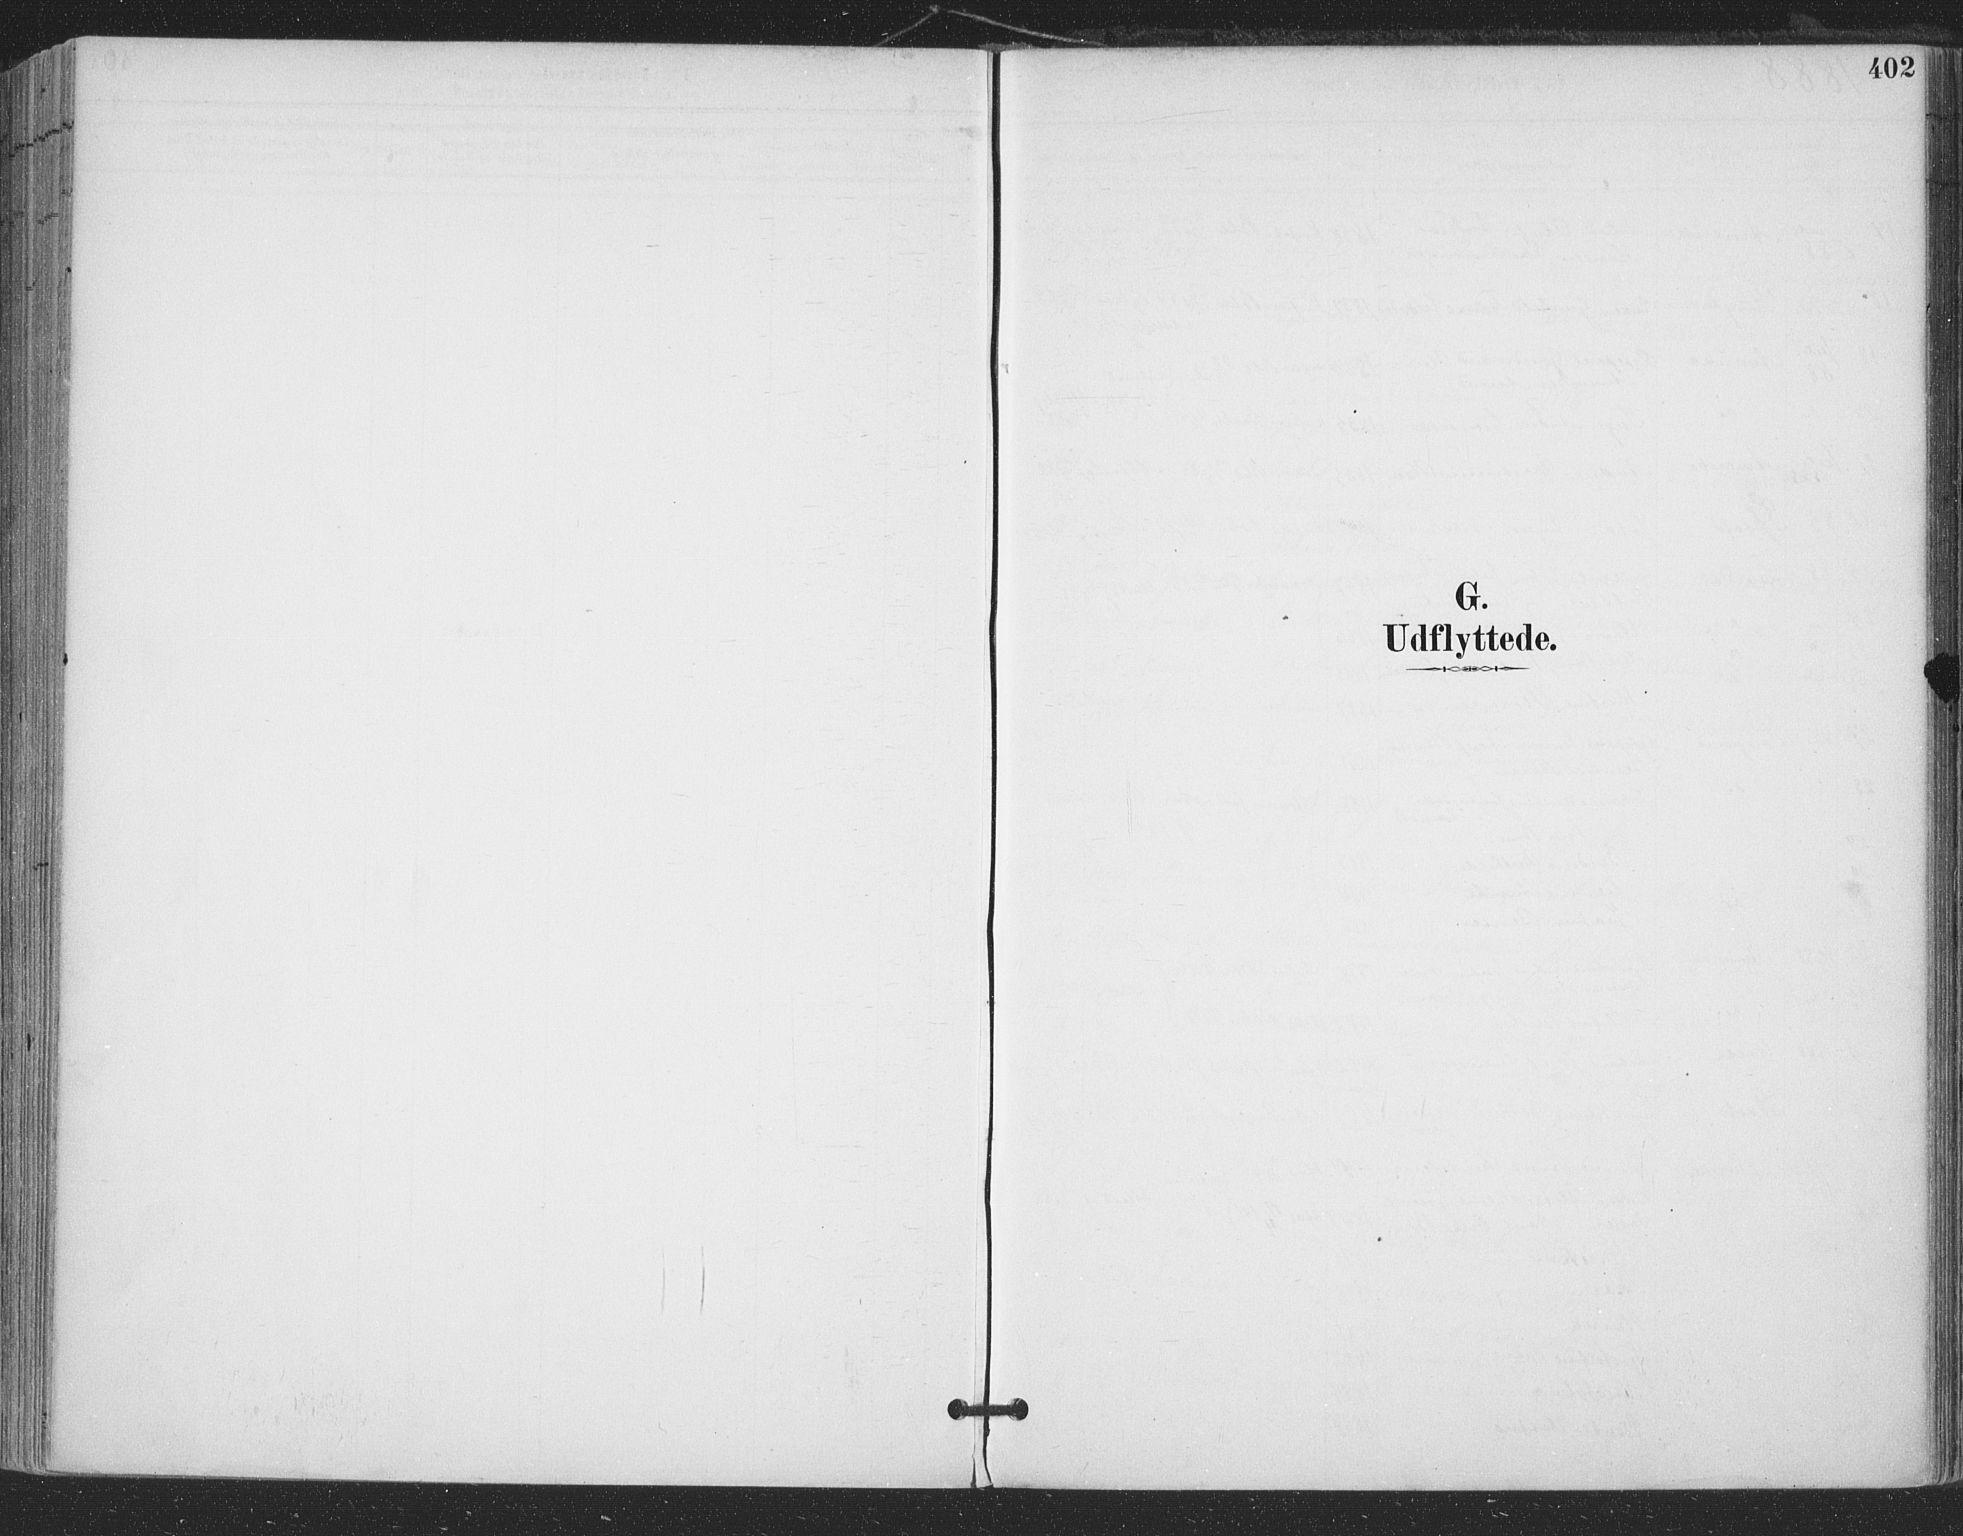 SAKO, Bamble kirkebøker, F/Fa/L0008: Ministerialbok nr. I 8, 1888-1900, s. 402